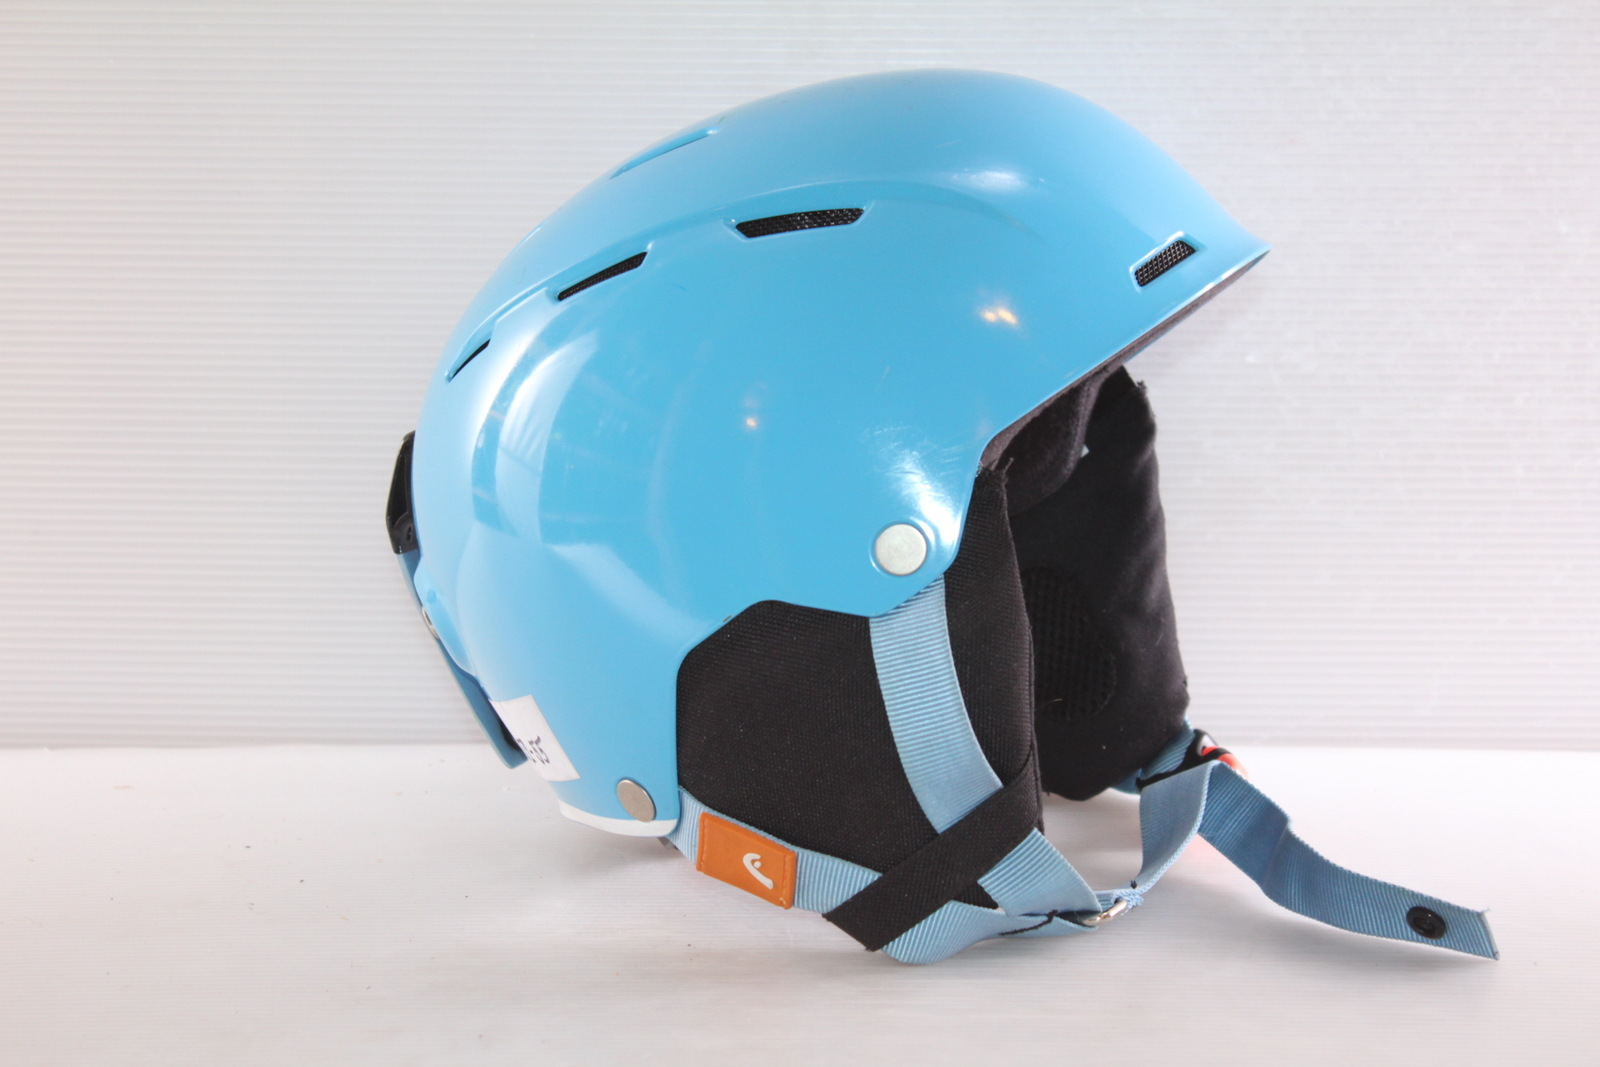 Dětská lyžařská helma Head Air Cyan - posuvná vel. 52 - 55